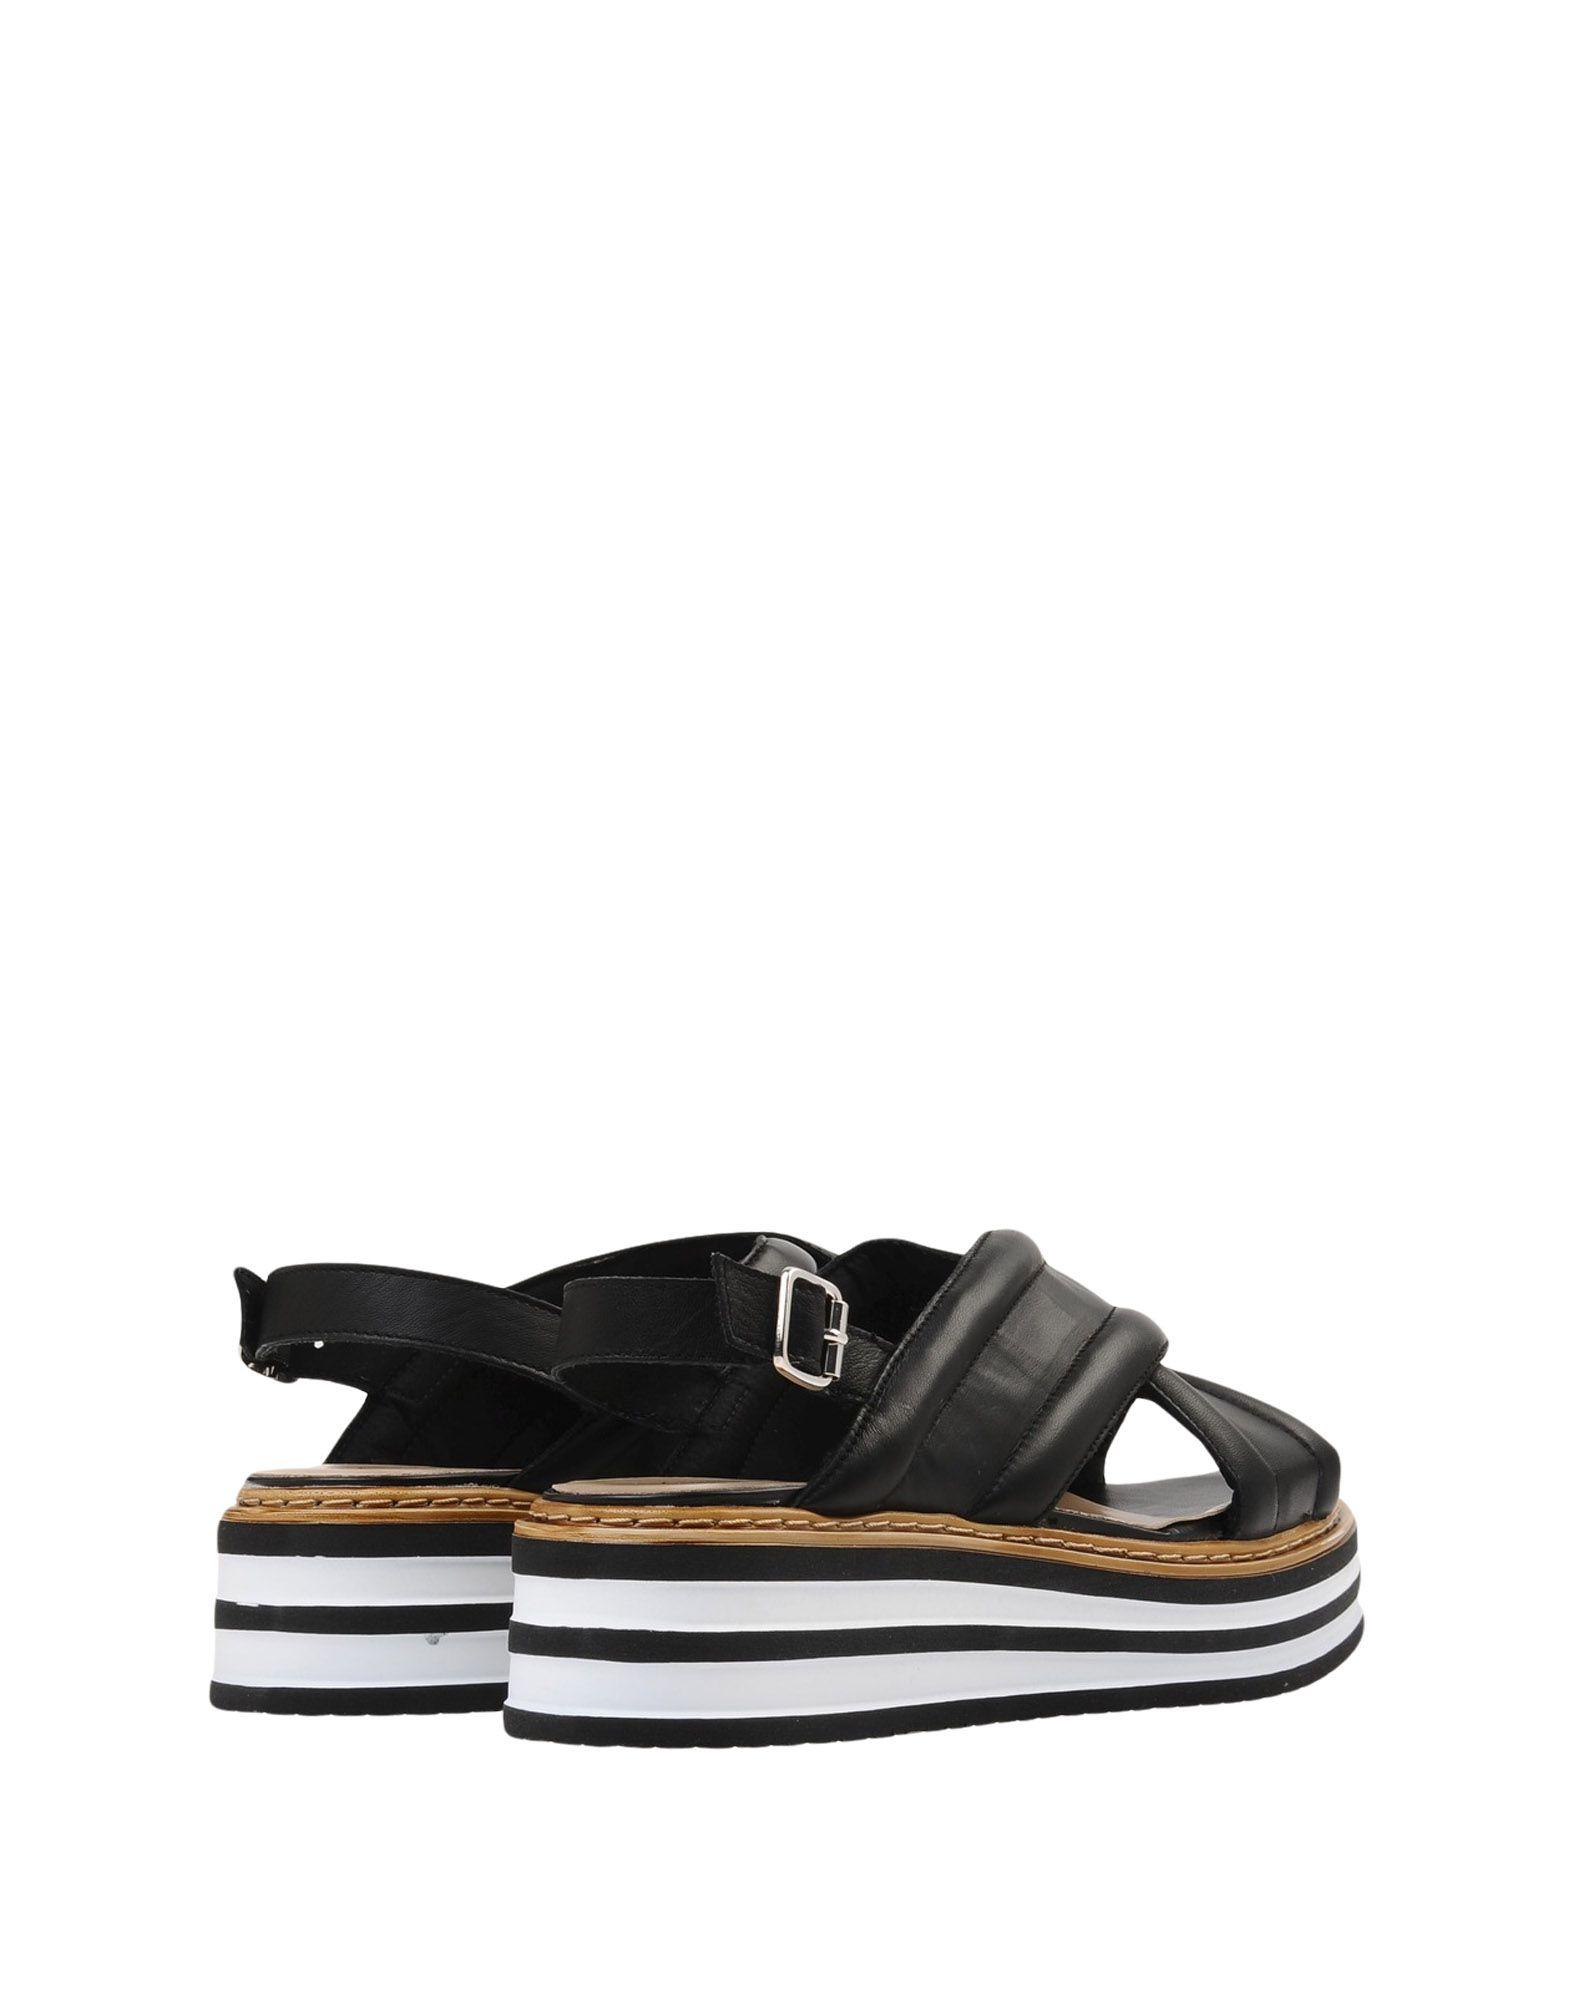 George J. Love Sandalen Damen Schuhe  11489941NI Neue Schuhe Damen fc6db6